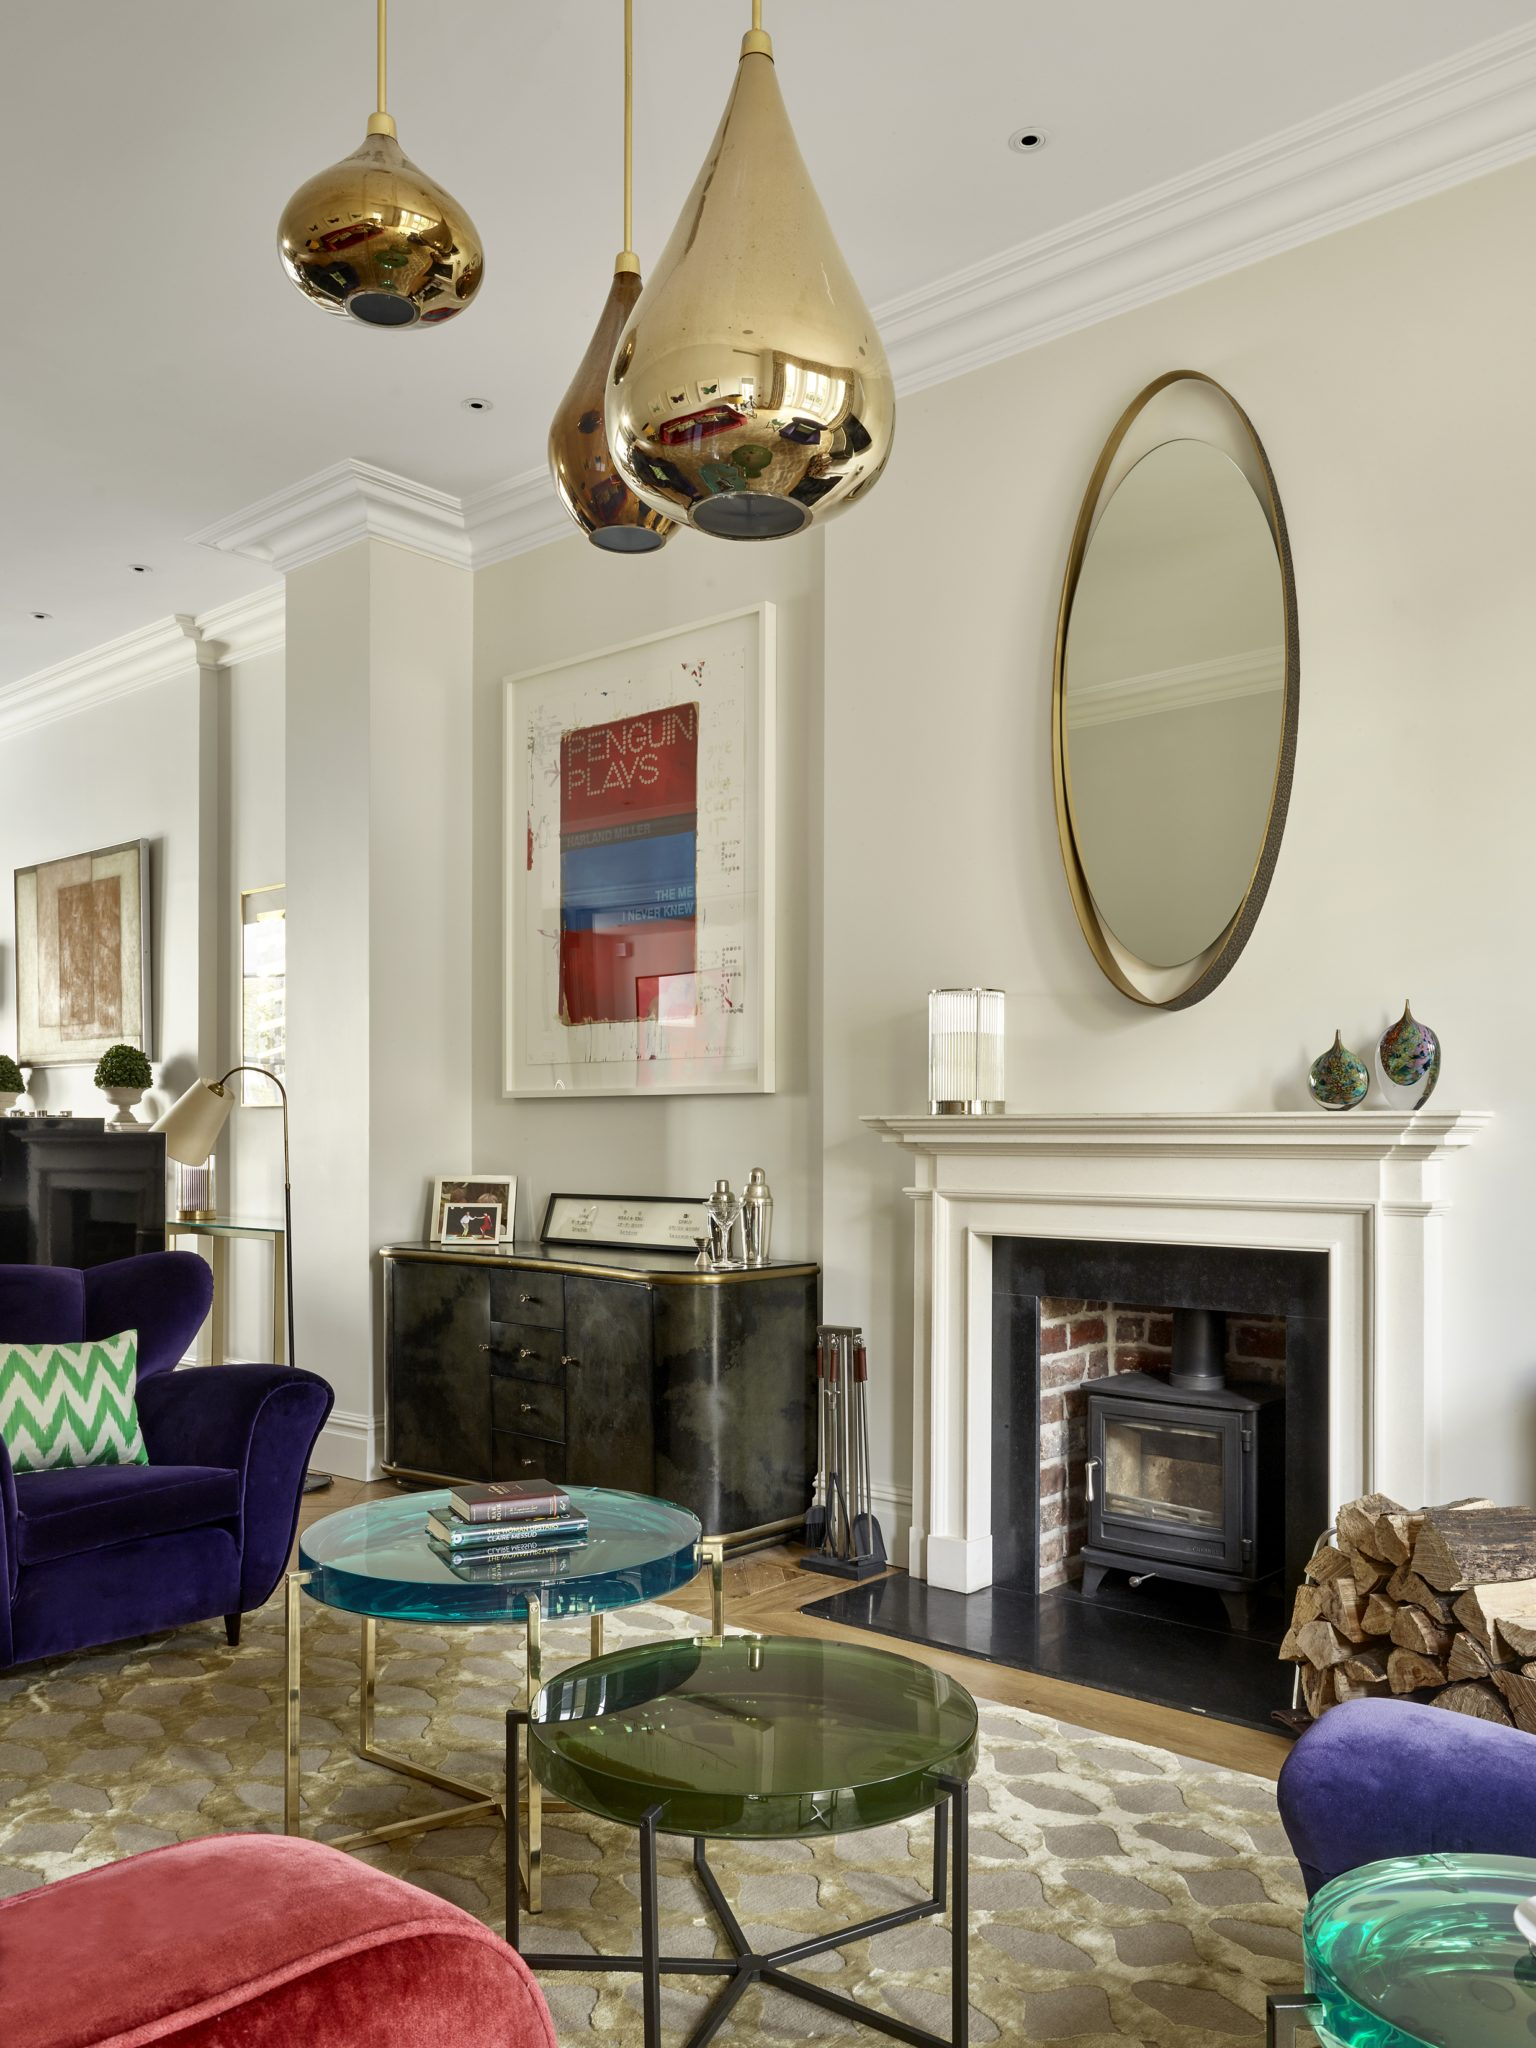 Living Room. Kensington, London by Caz Myers